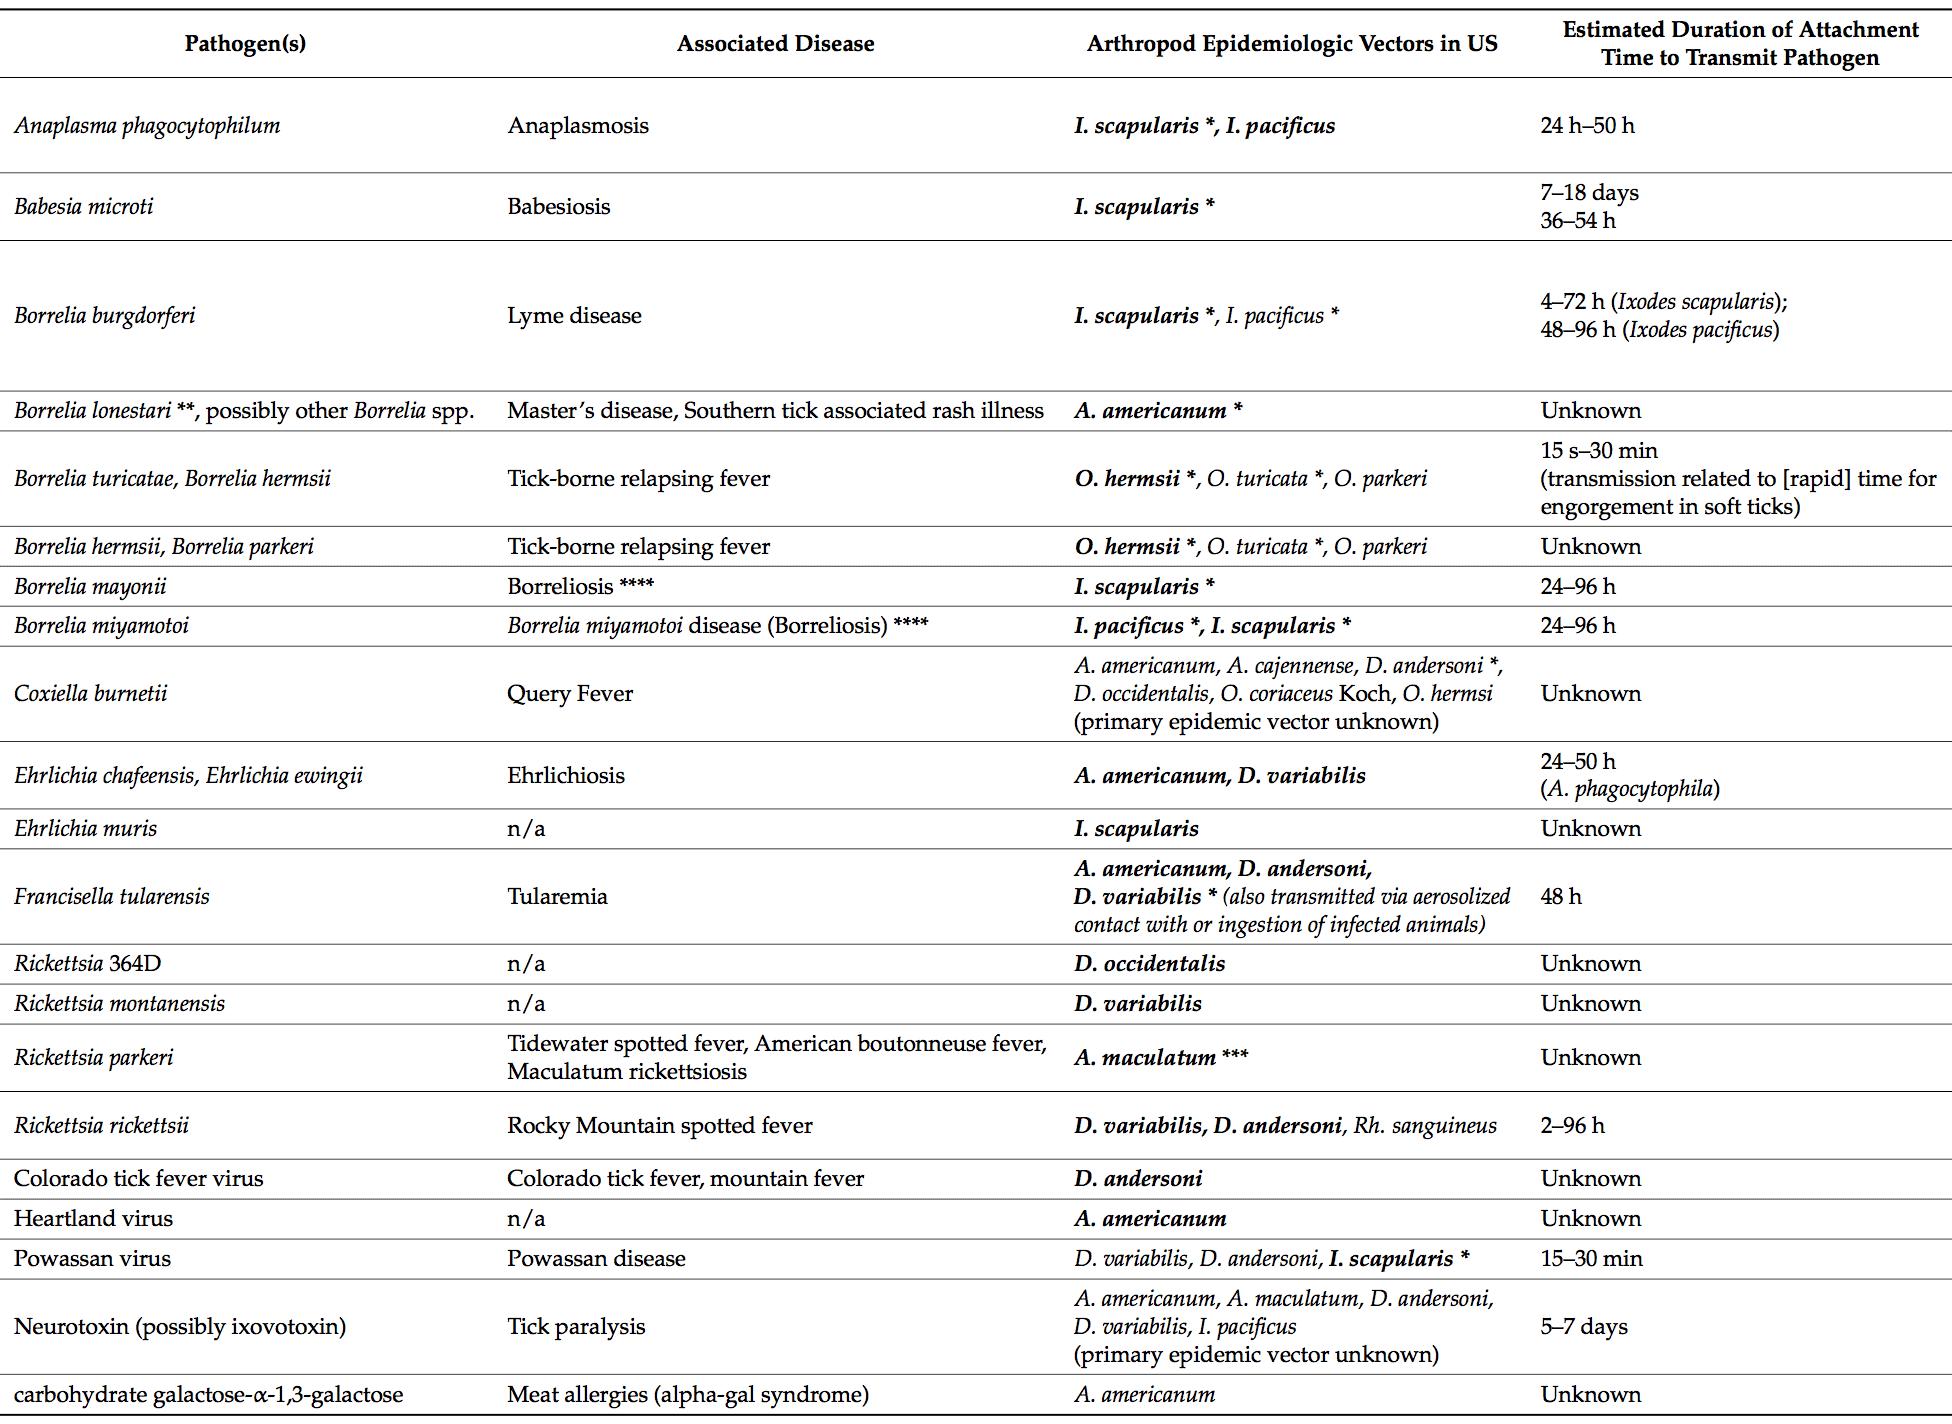 Disease Transmission Times